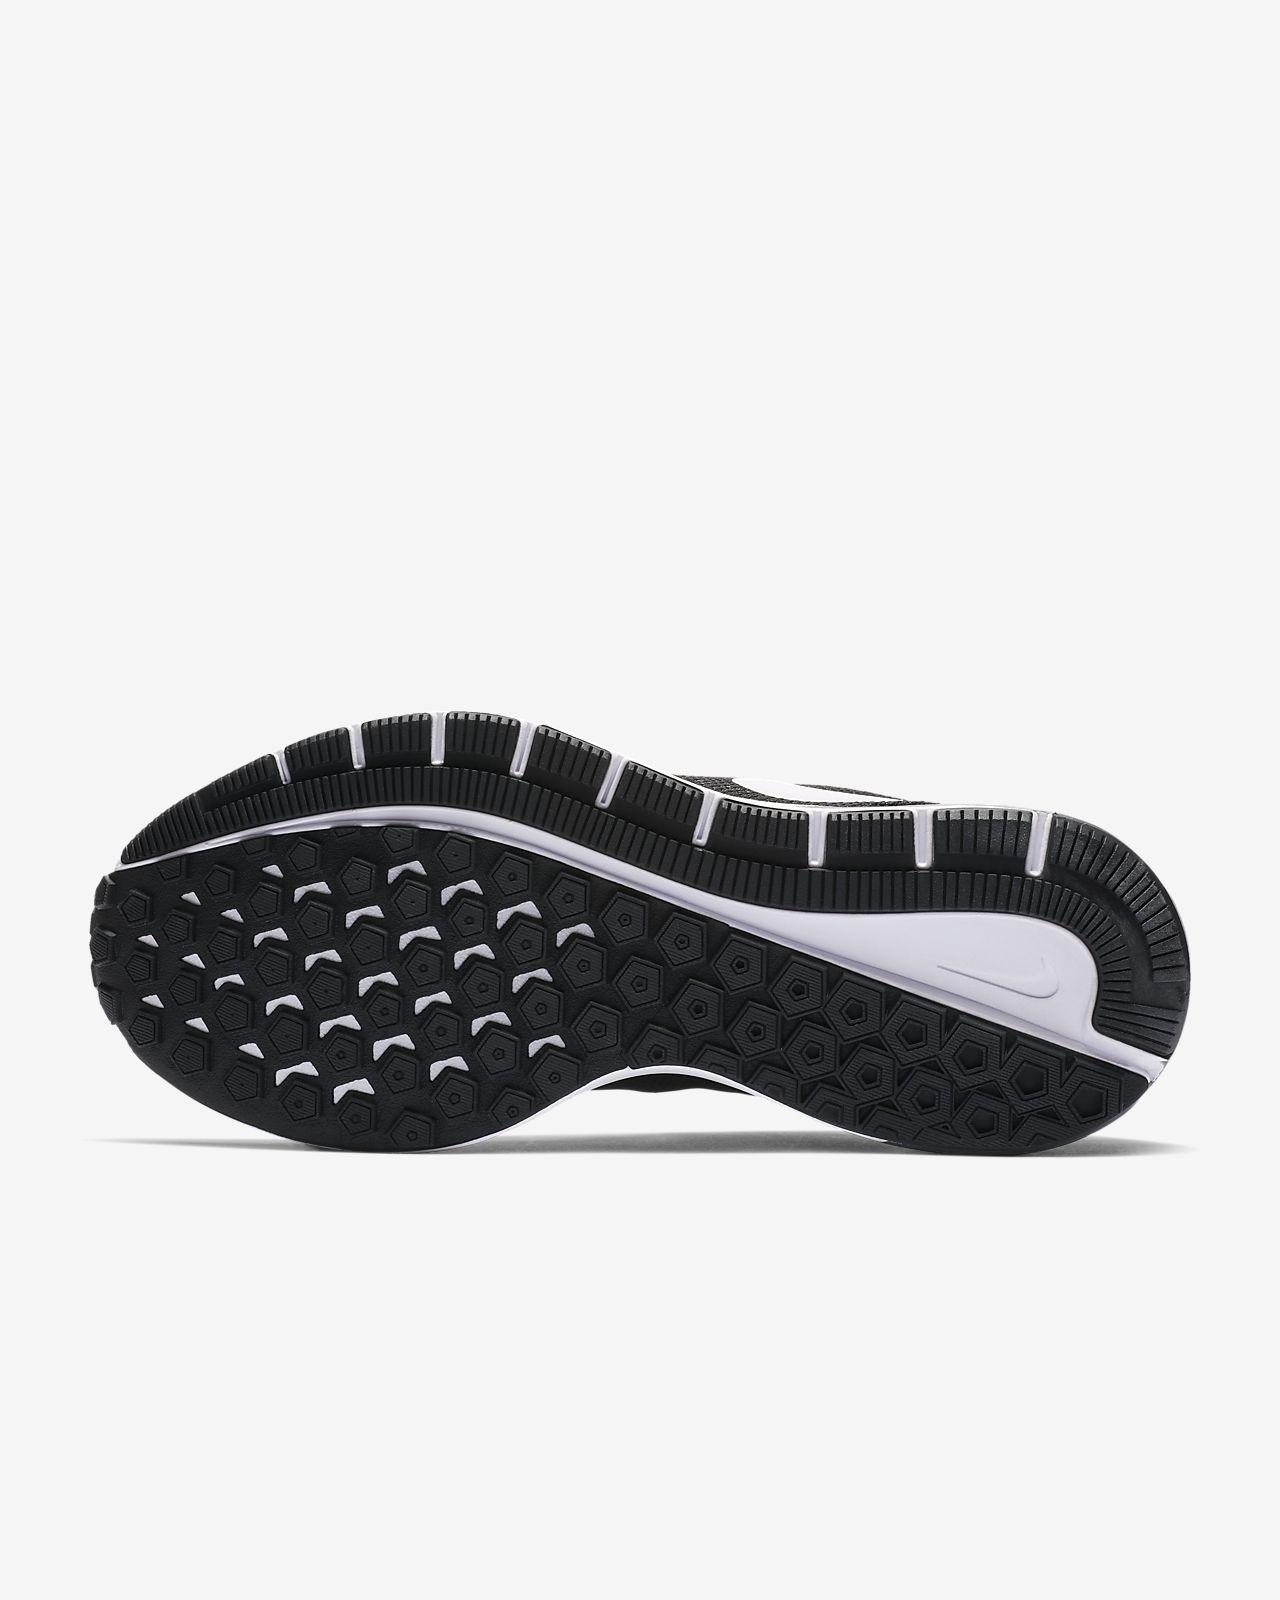 Löparsko Nike Air Zoom Structure 22 för kvinnor. Nike SE